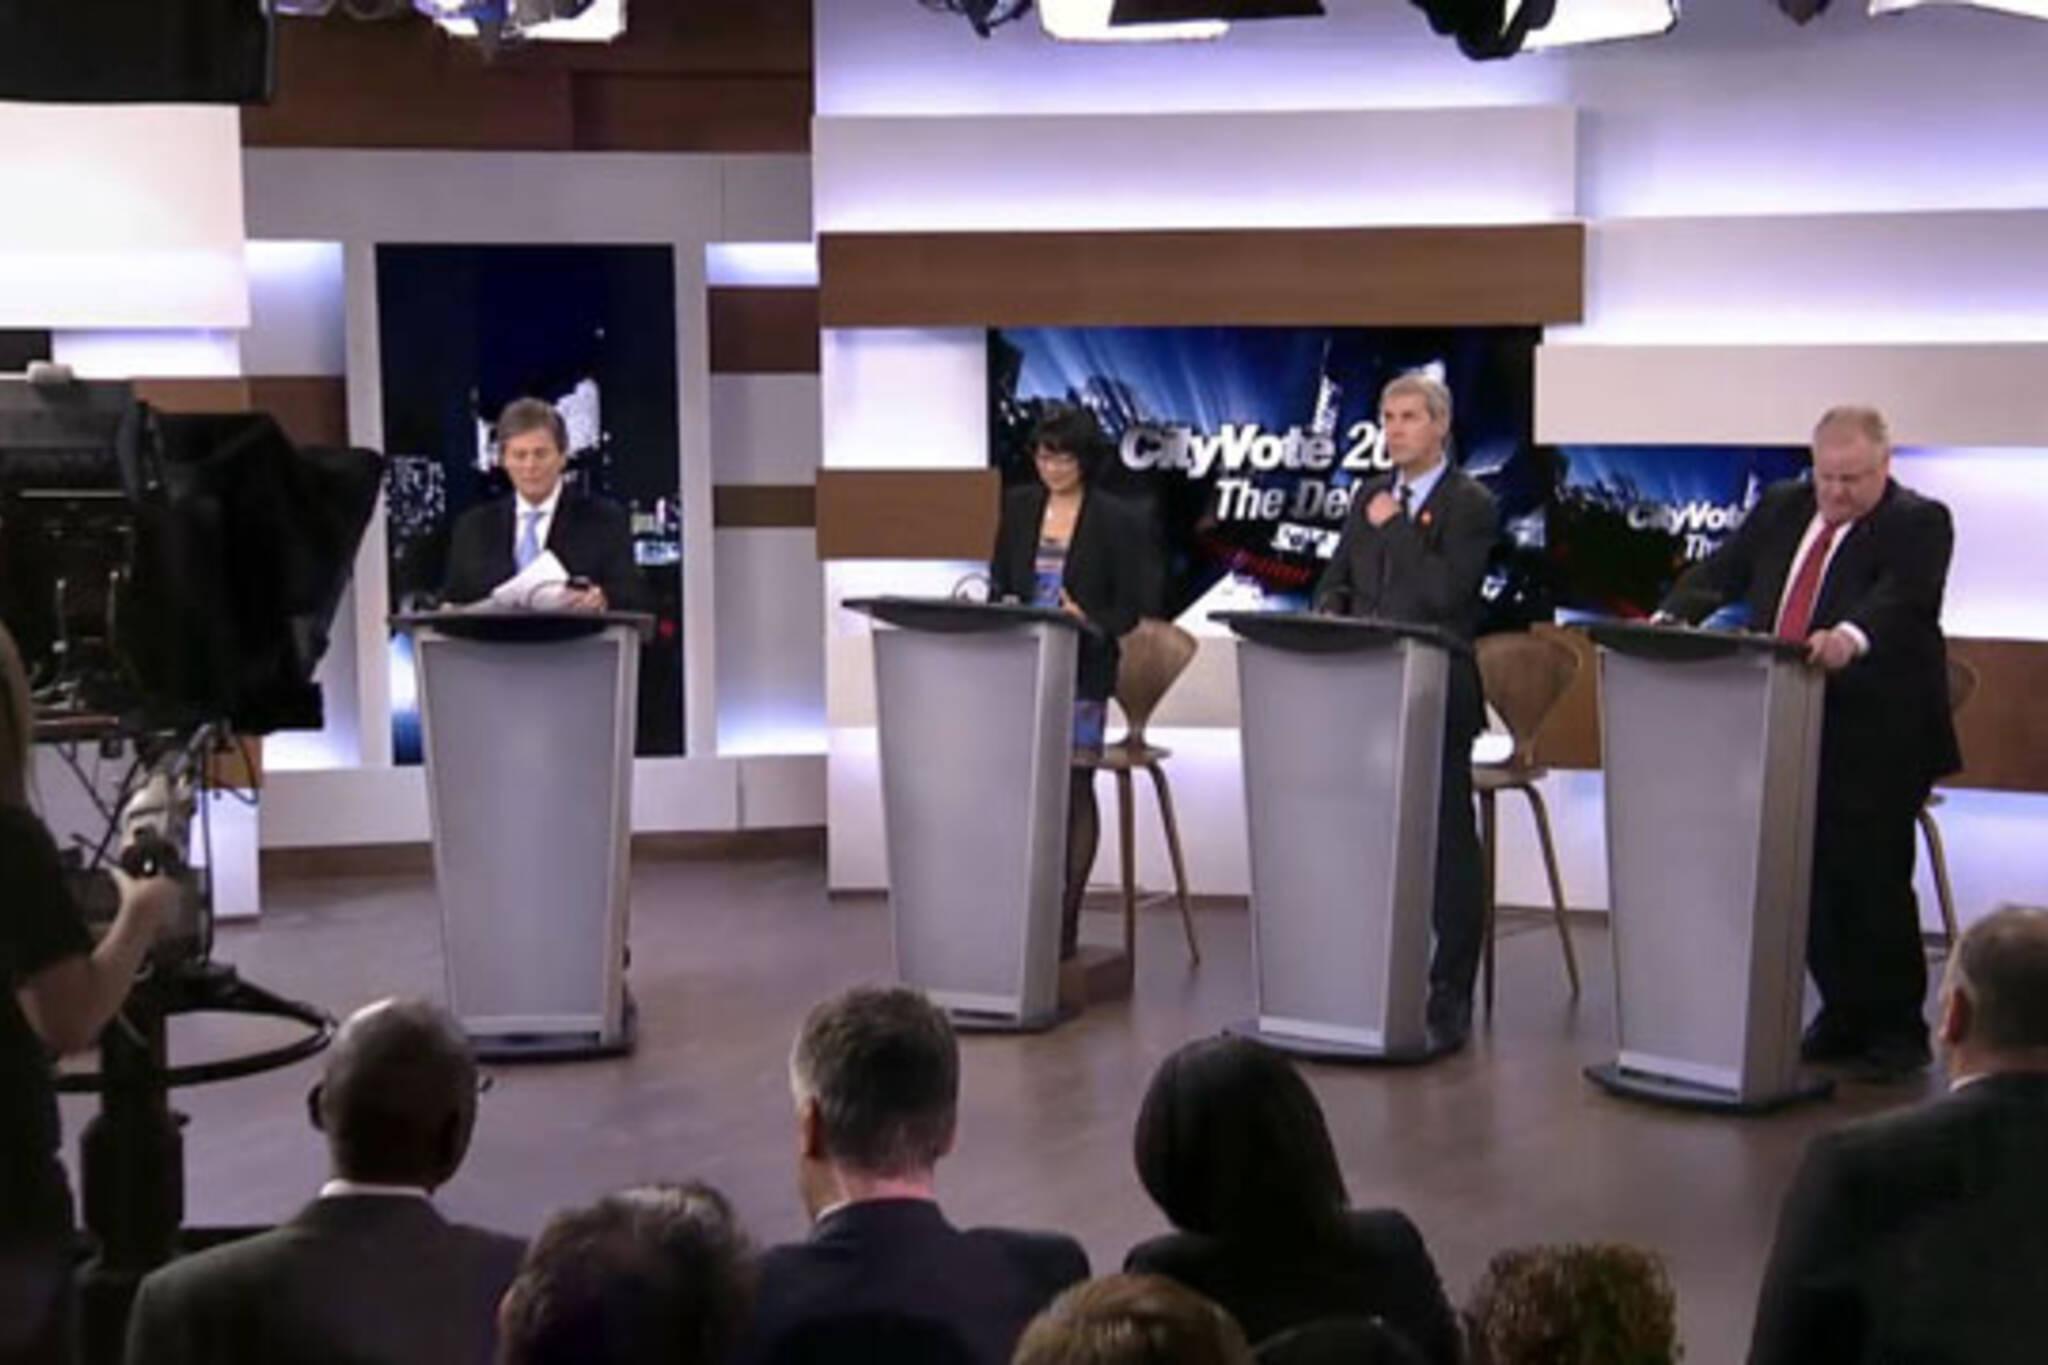 Toronto mayoral debate